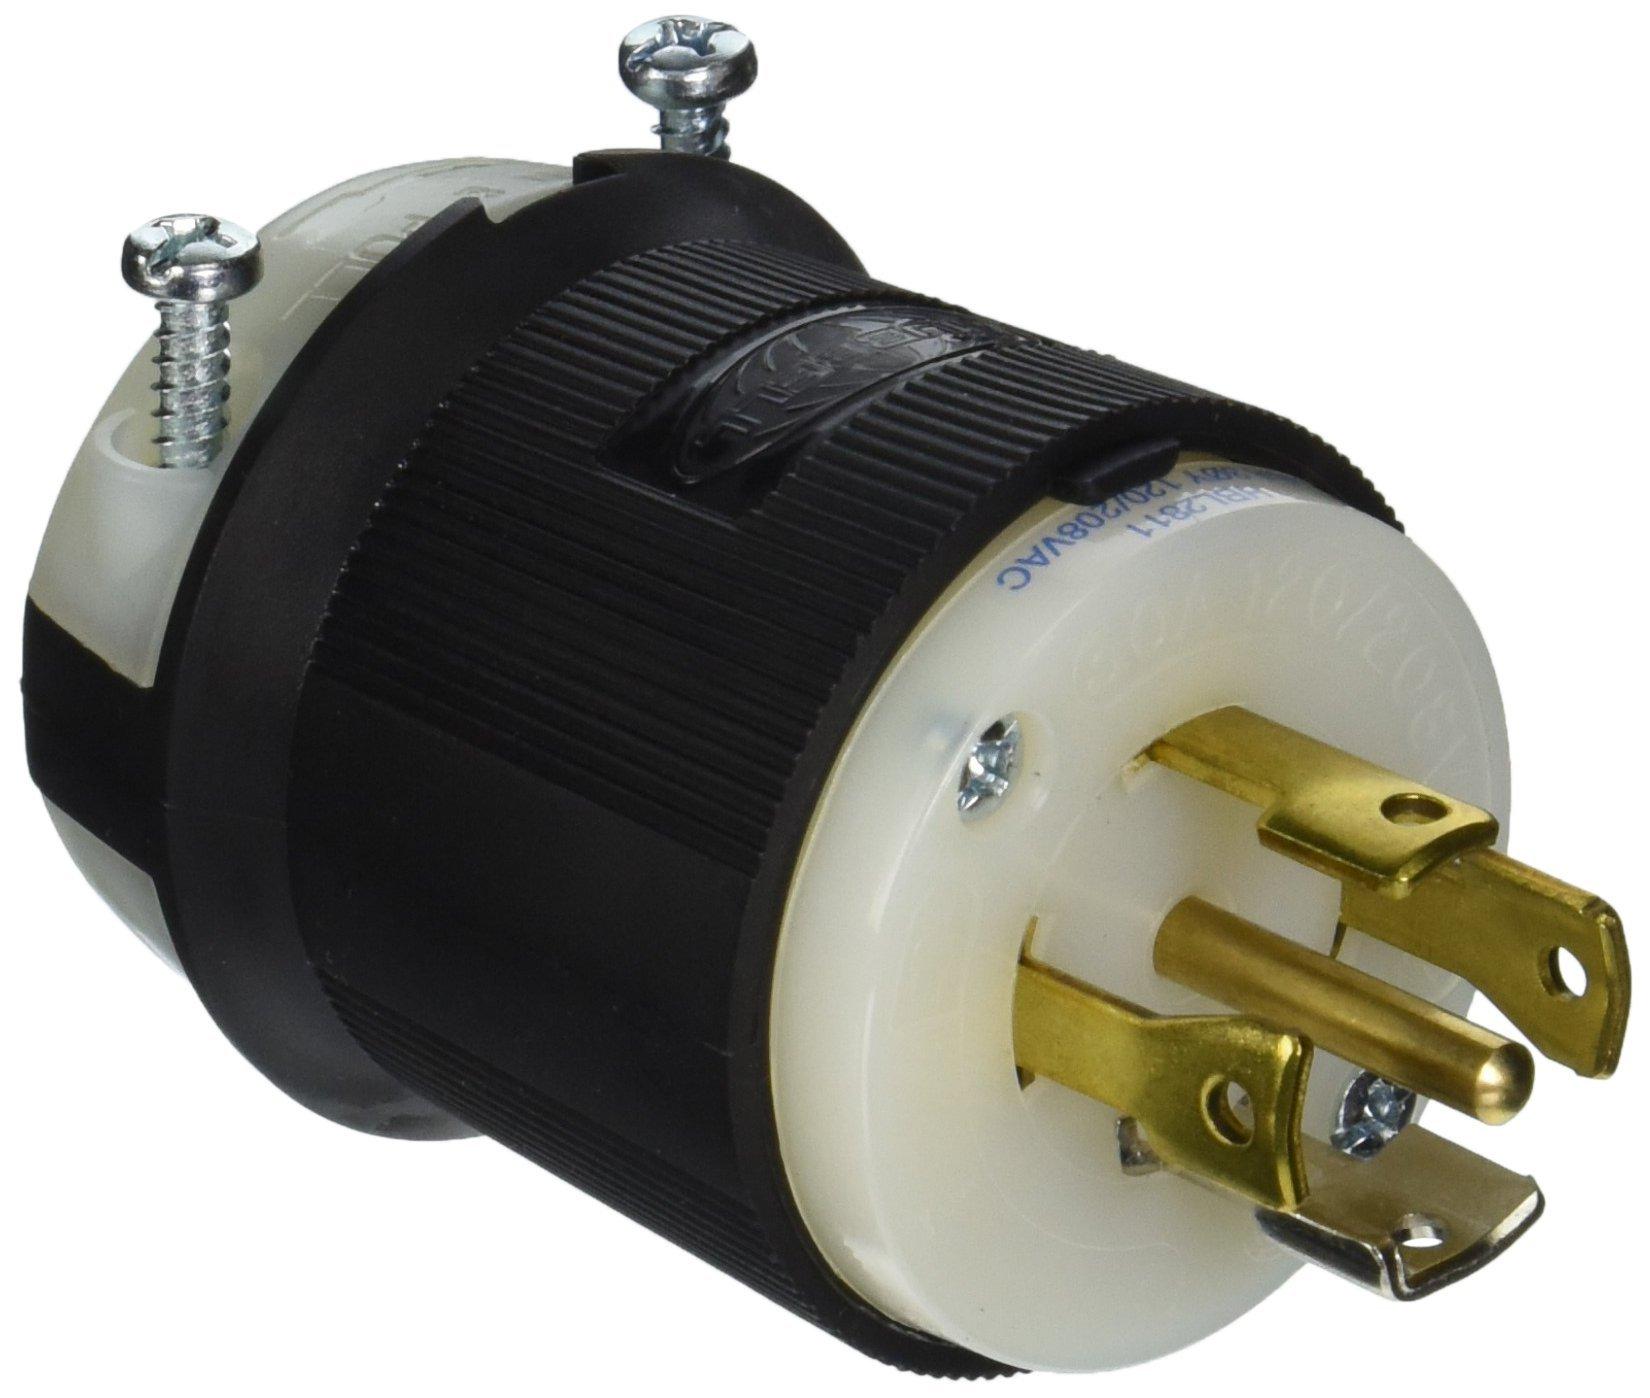 Hubbell HBL2811 Locking Plug, 4 Pole, 5 Wire, 30 amp, 120/208V, L21-30P